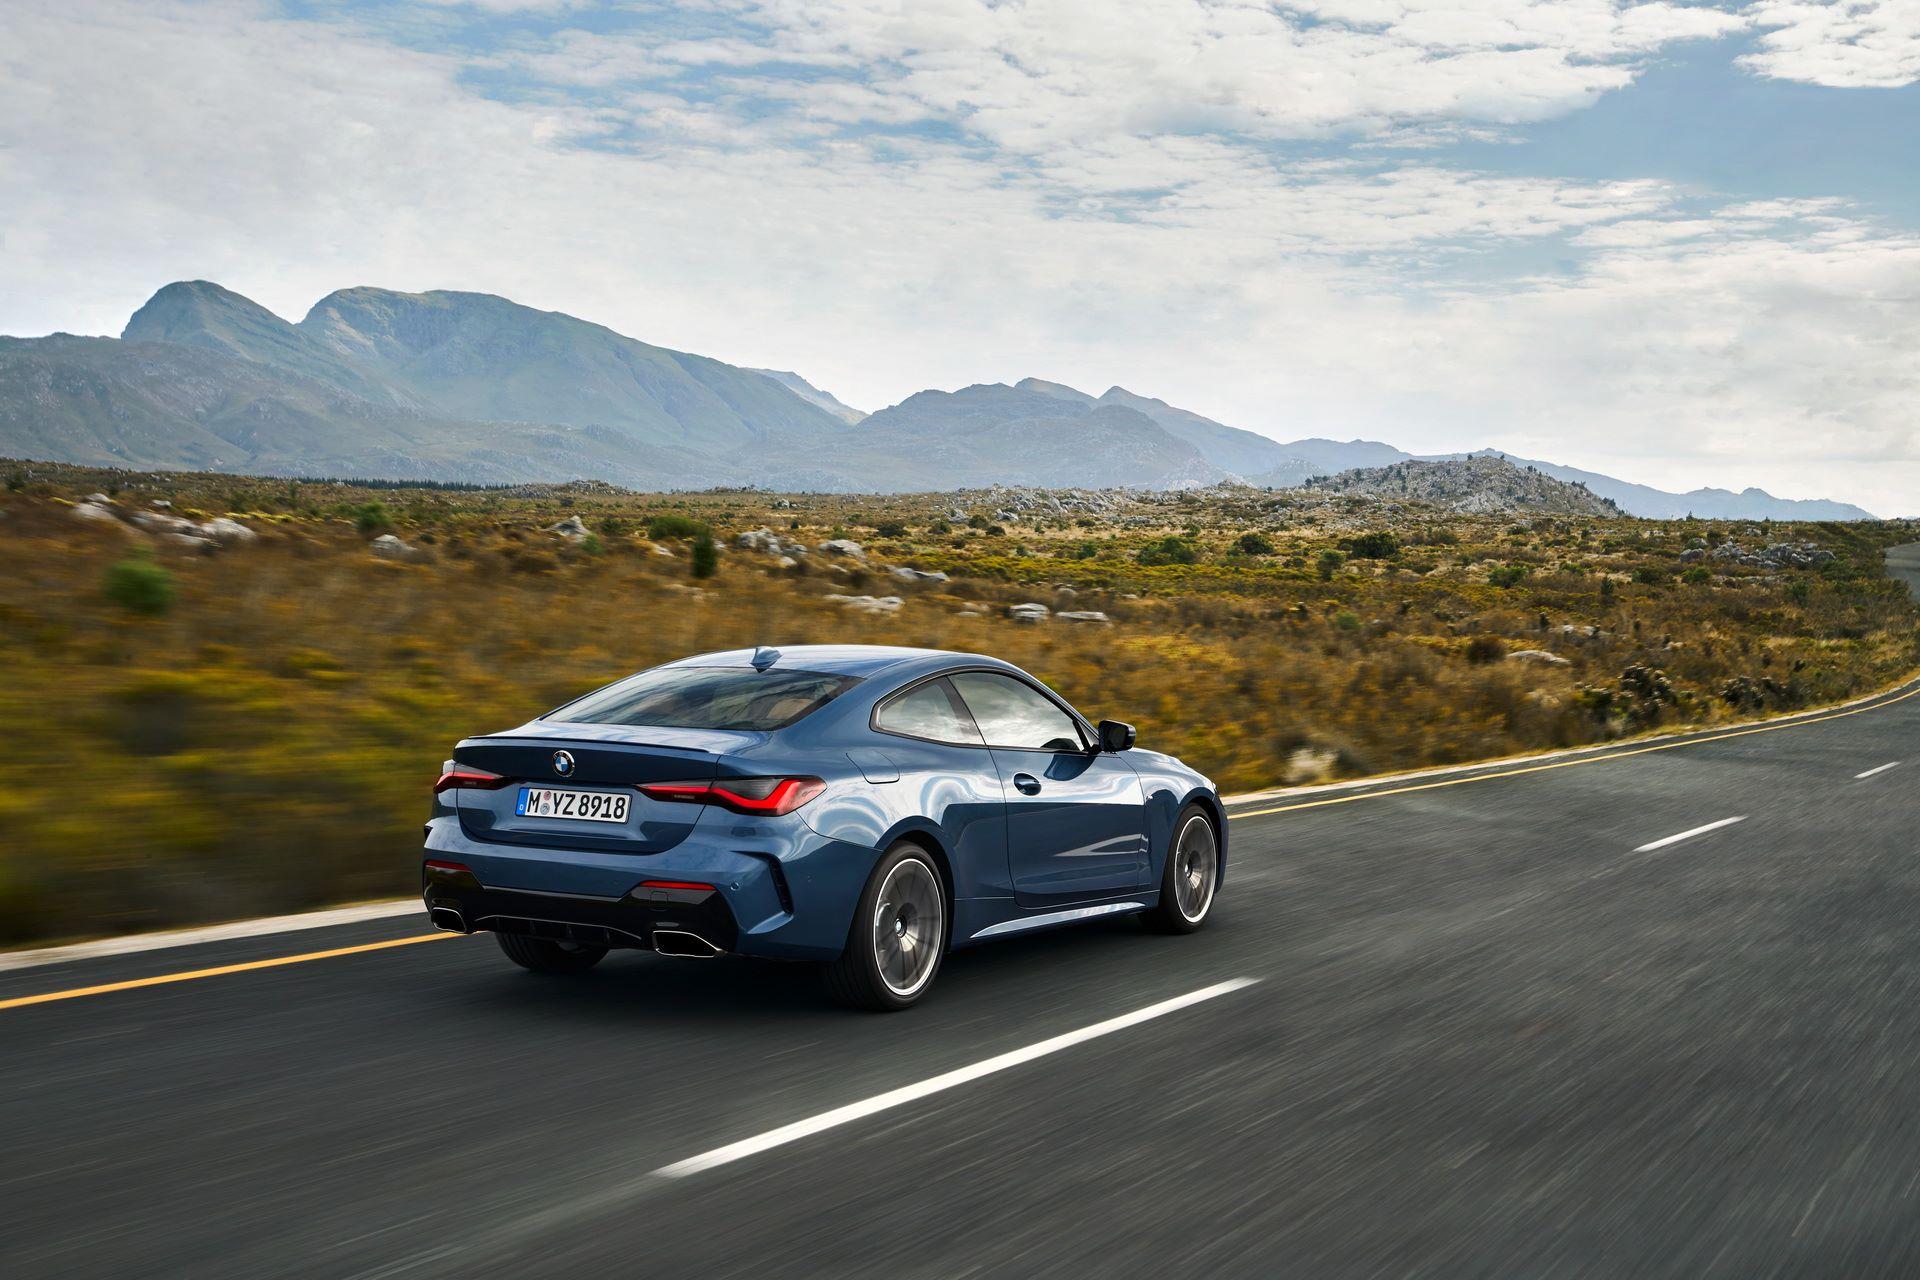 BMW-4-Series-2020-32